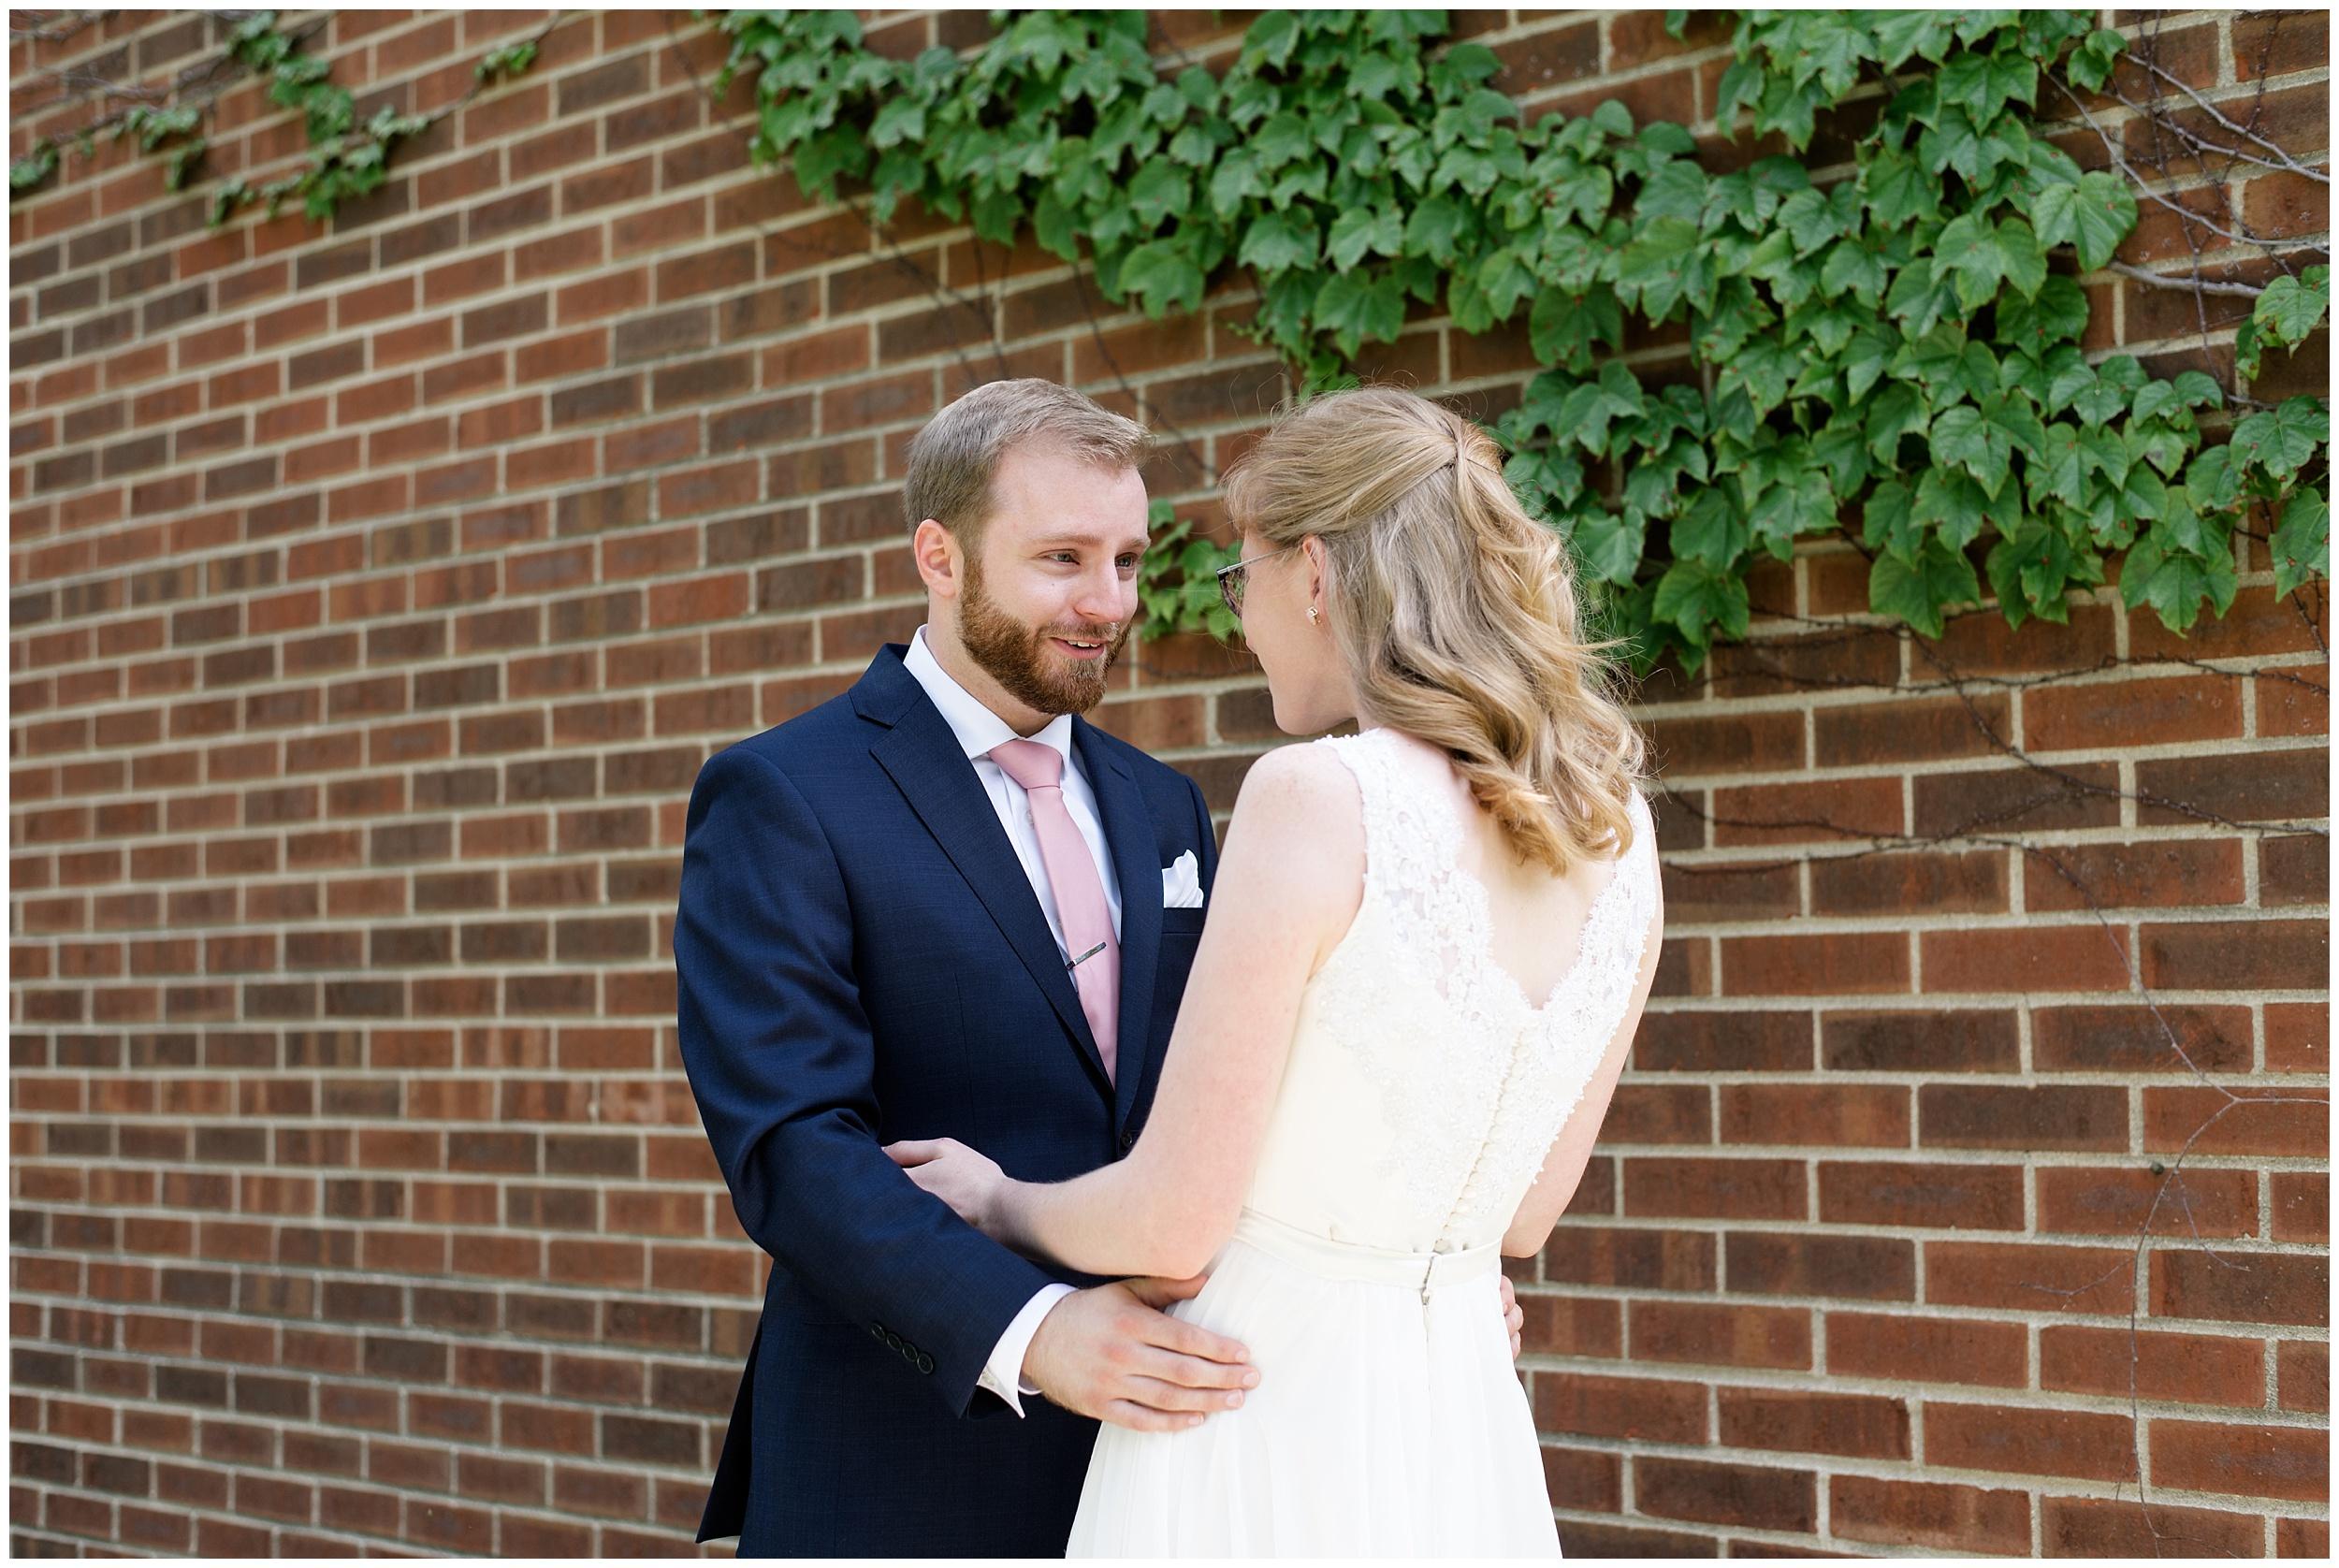 highland-park-community-house-wedding-chicago-wisconsin-photographer_0026.jpg